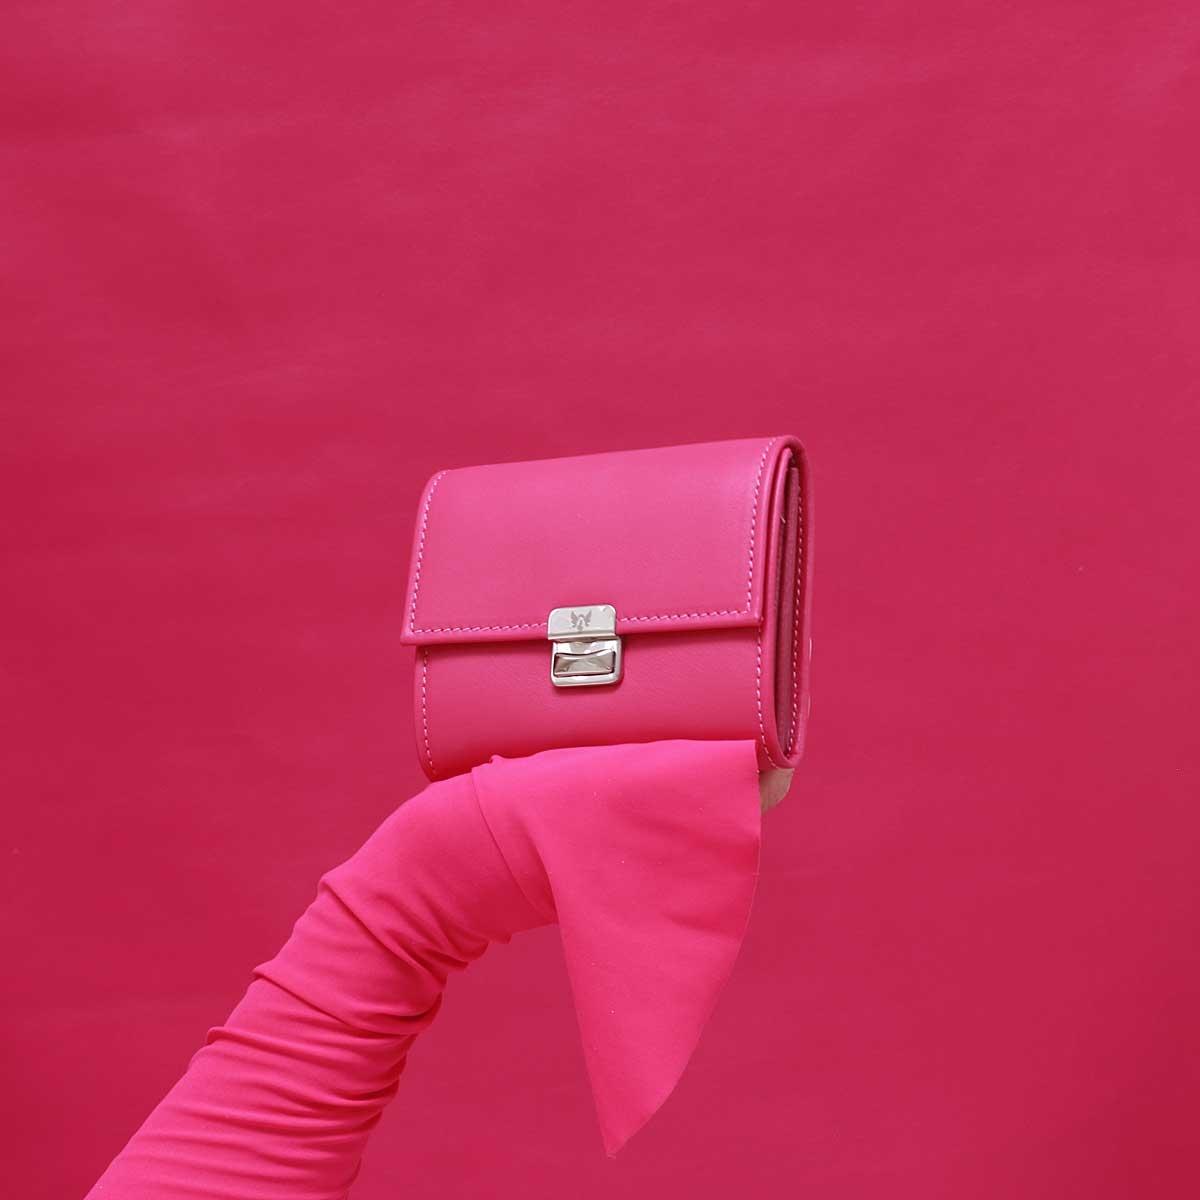 elfenklang geldbeutel pink klein